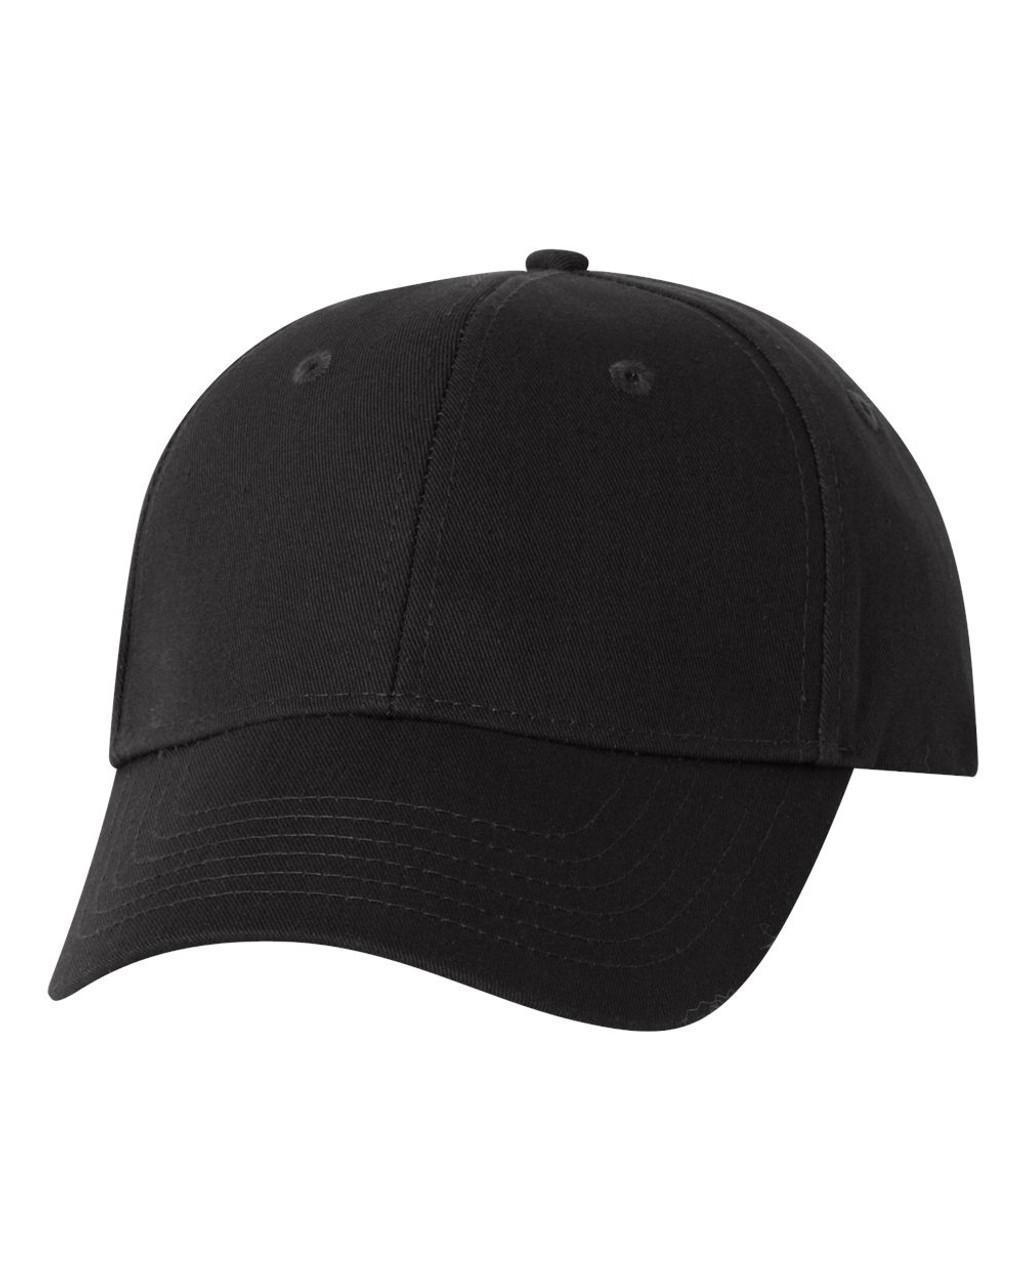 VC600 Valucap Chino Hat   T-shirt.ca